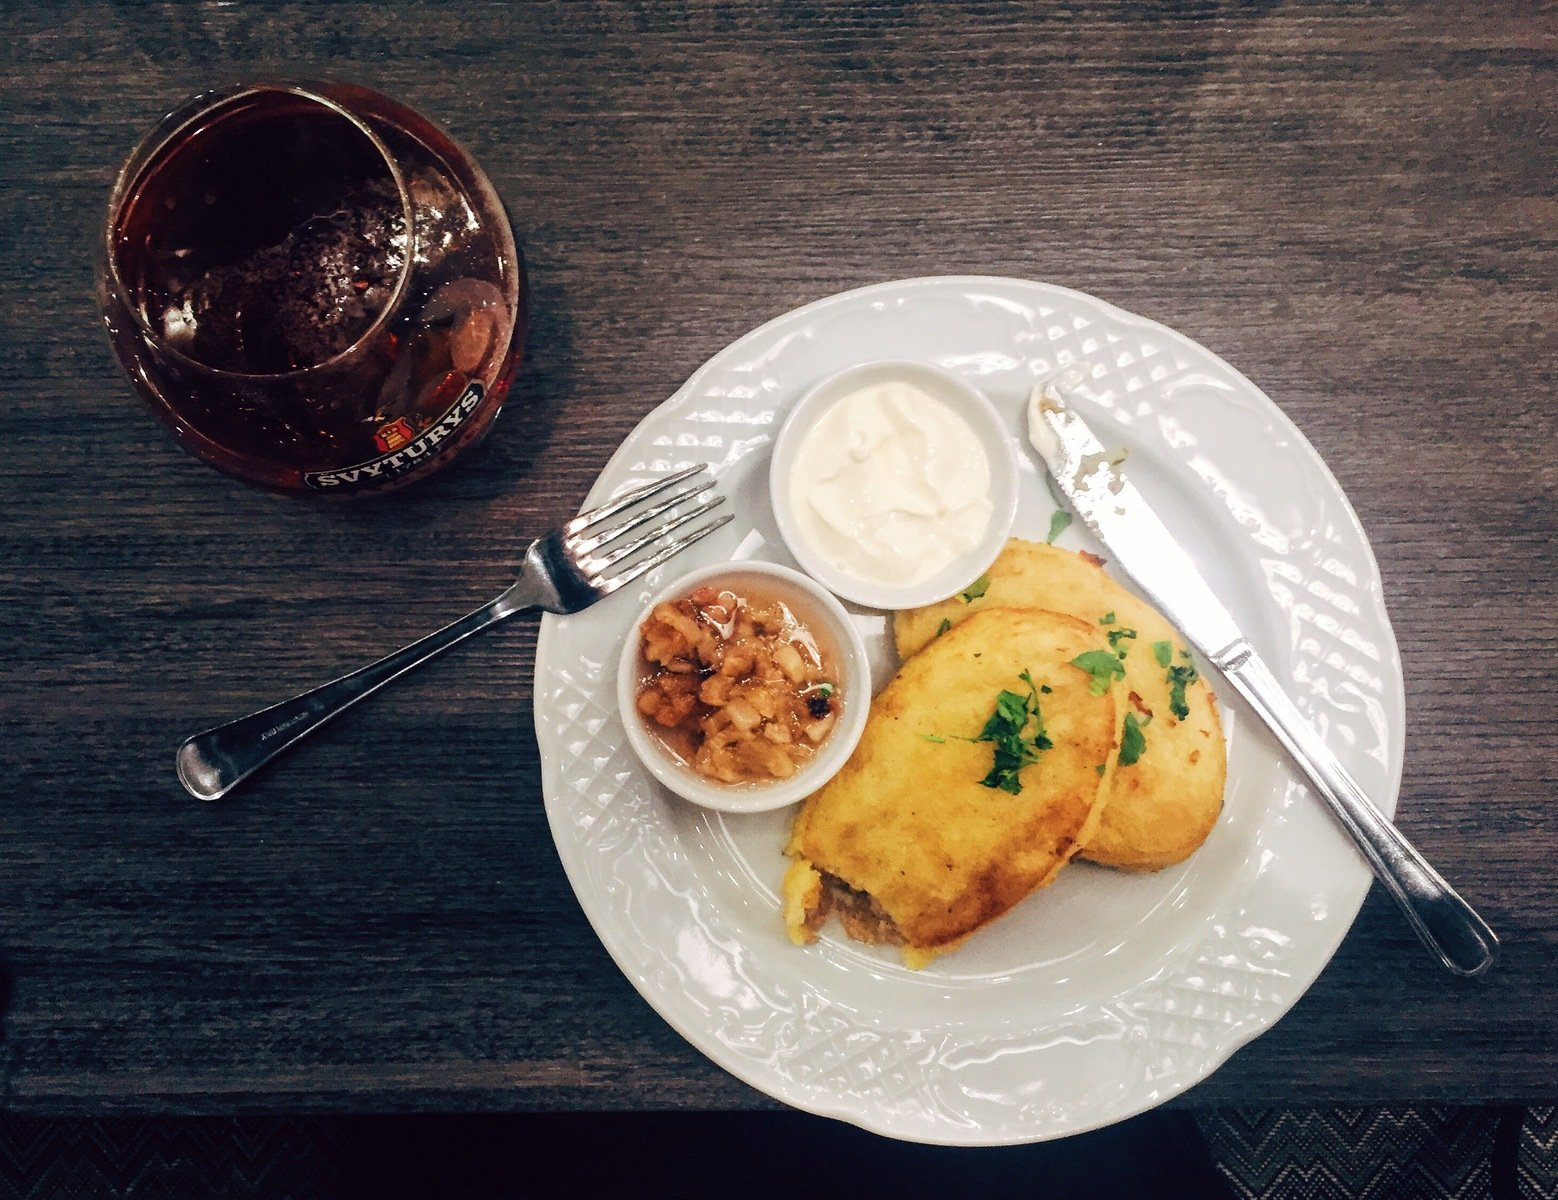 ZEMAICIU BLYNAI Lithuanian potato pancakes